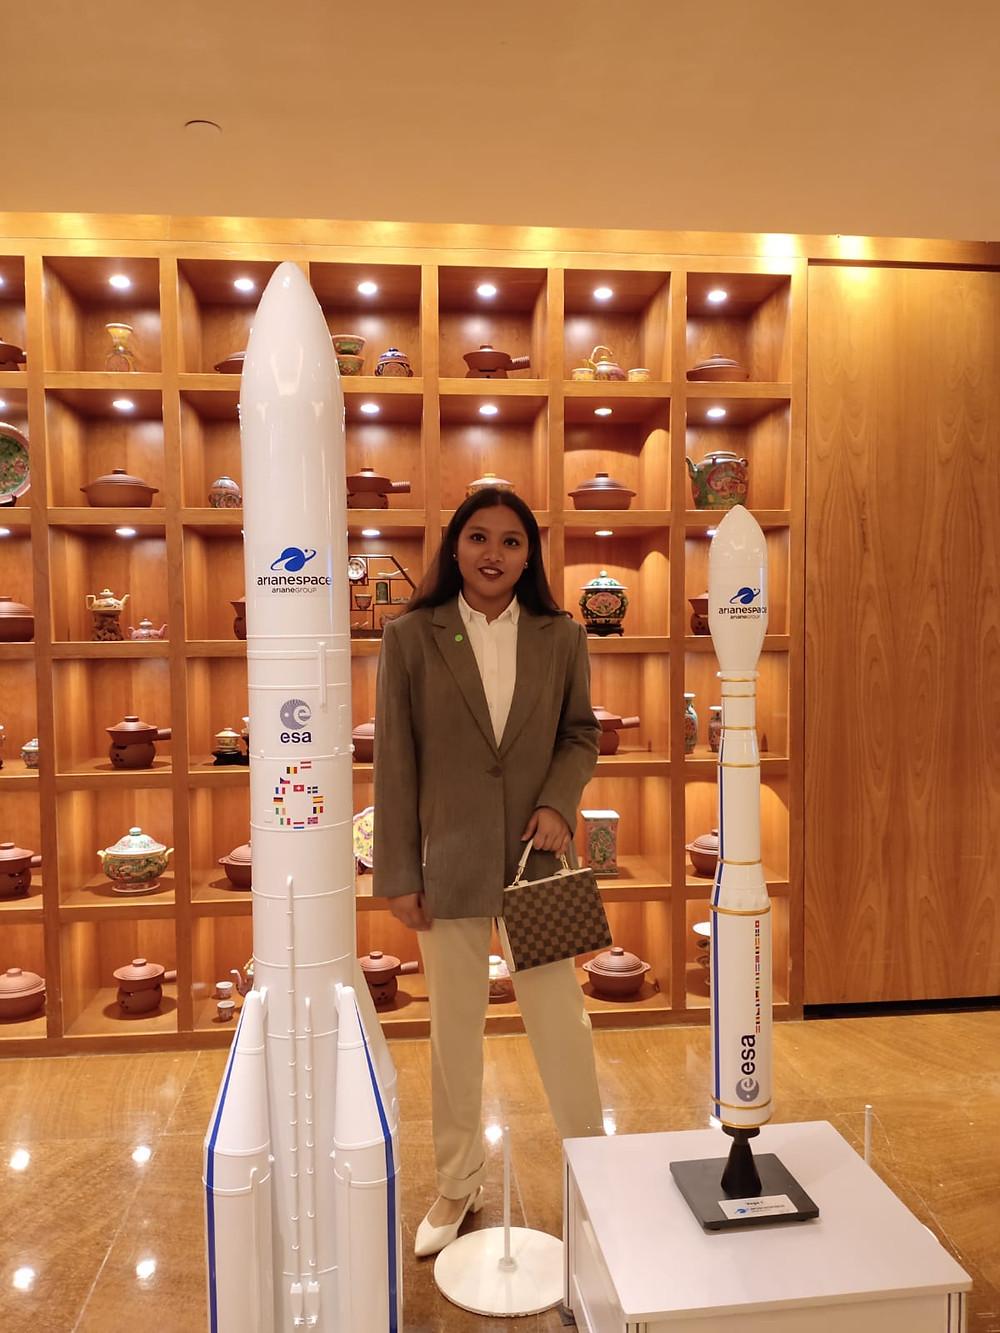 Kareema khan next to model aircraft